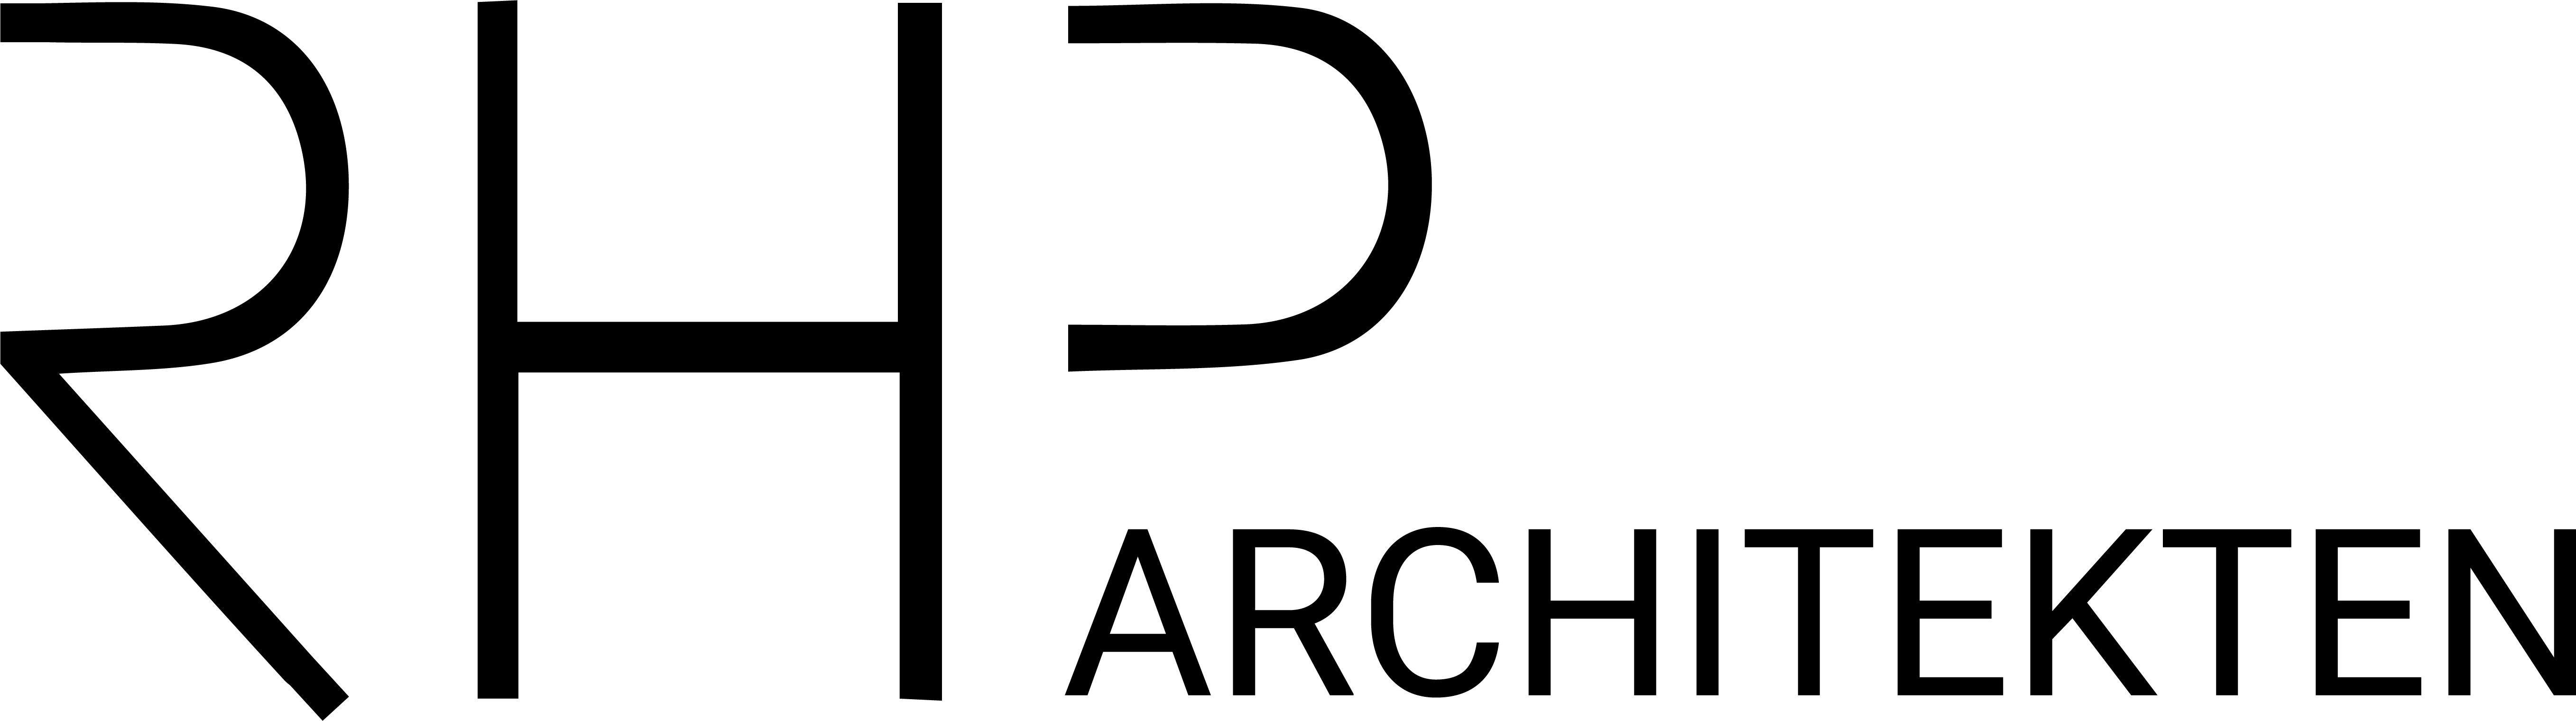 logo-Rhp_architekten.png